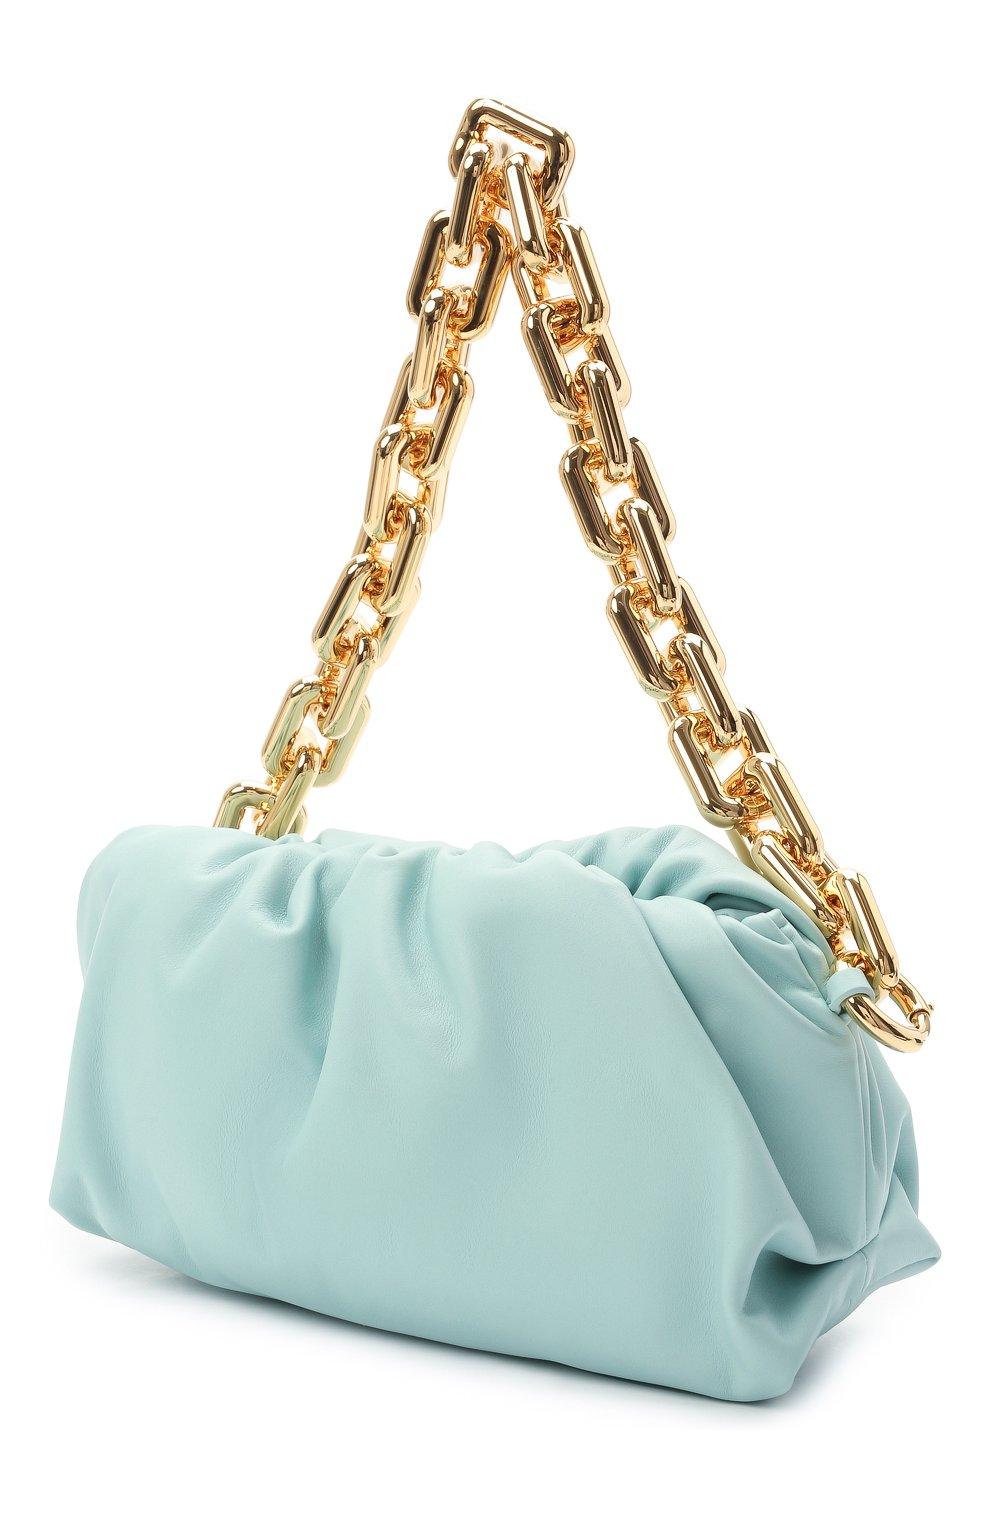 Женская сумка chain pouch BOTTEGA VENETA светло-голубого цвета, арт. 620230/VCP40 | Фото 3